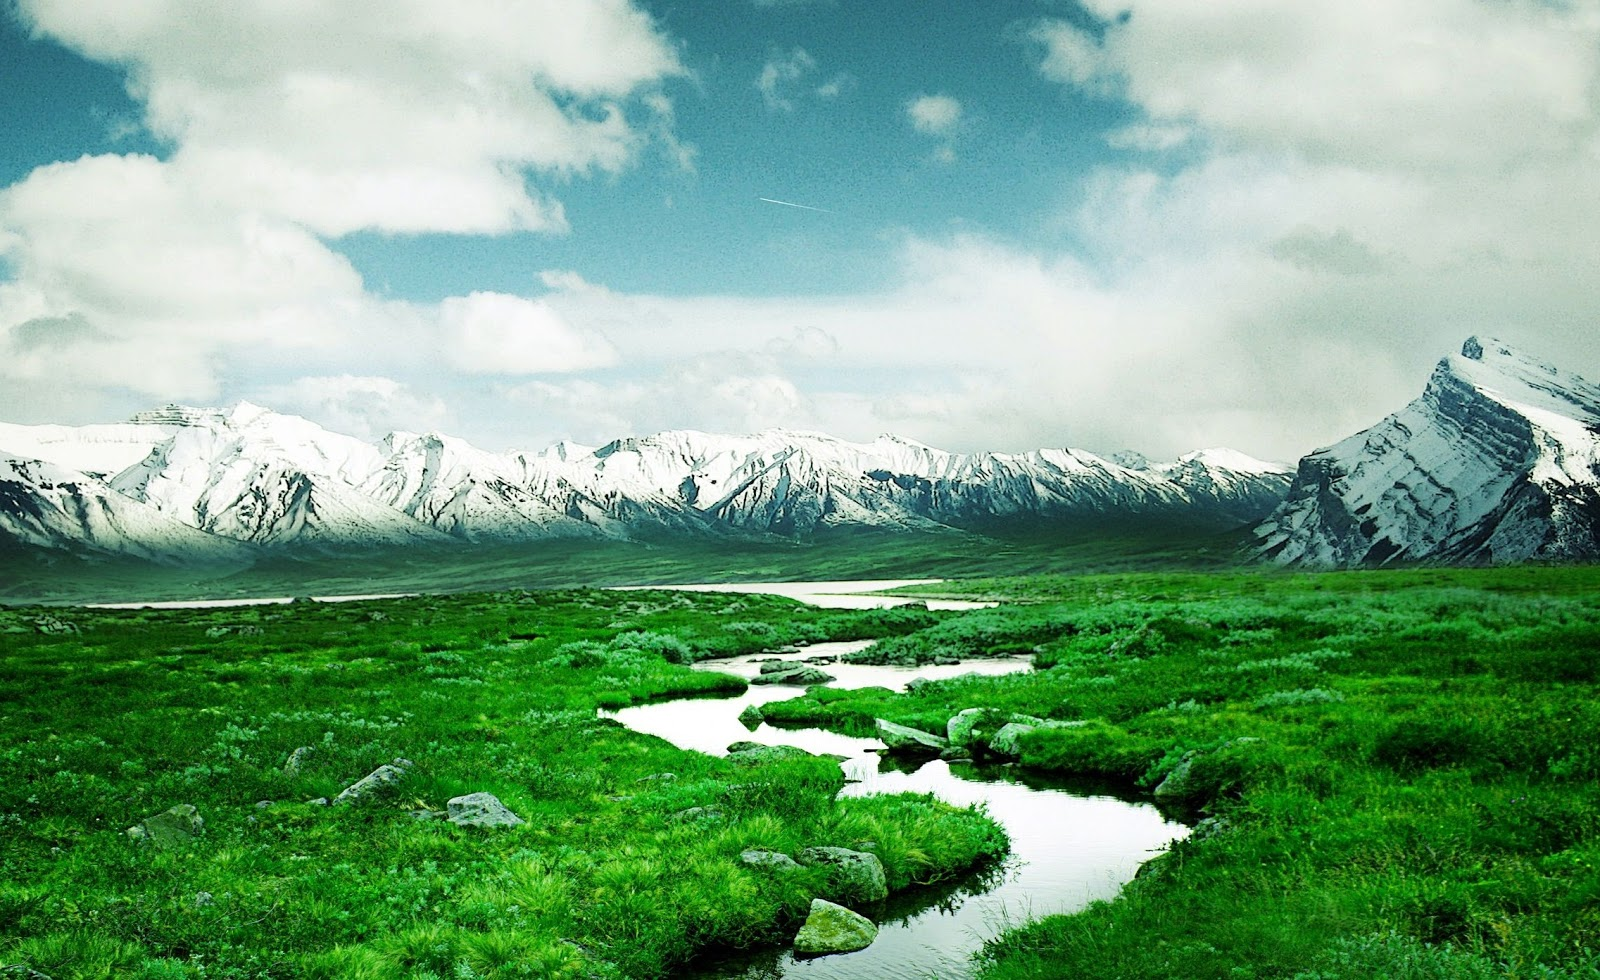 Beautiful Nature HD Wallpaper - Wallpapers